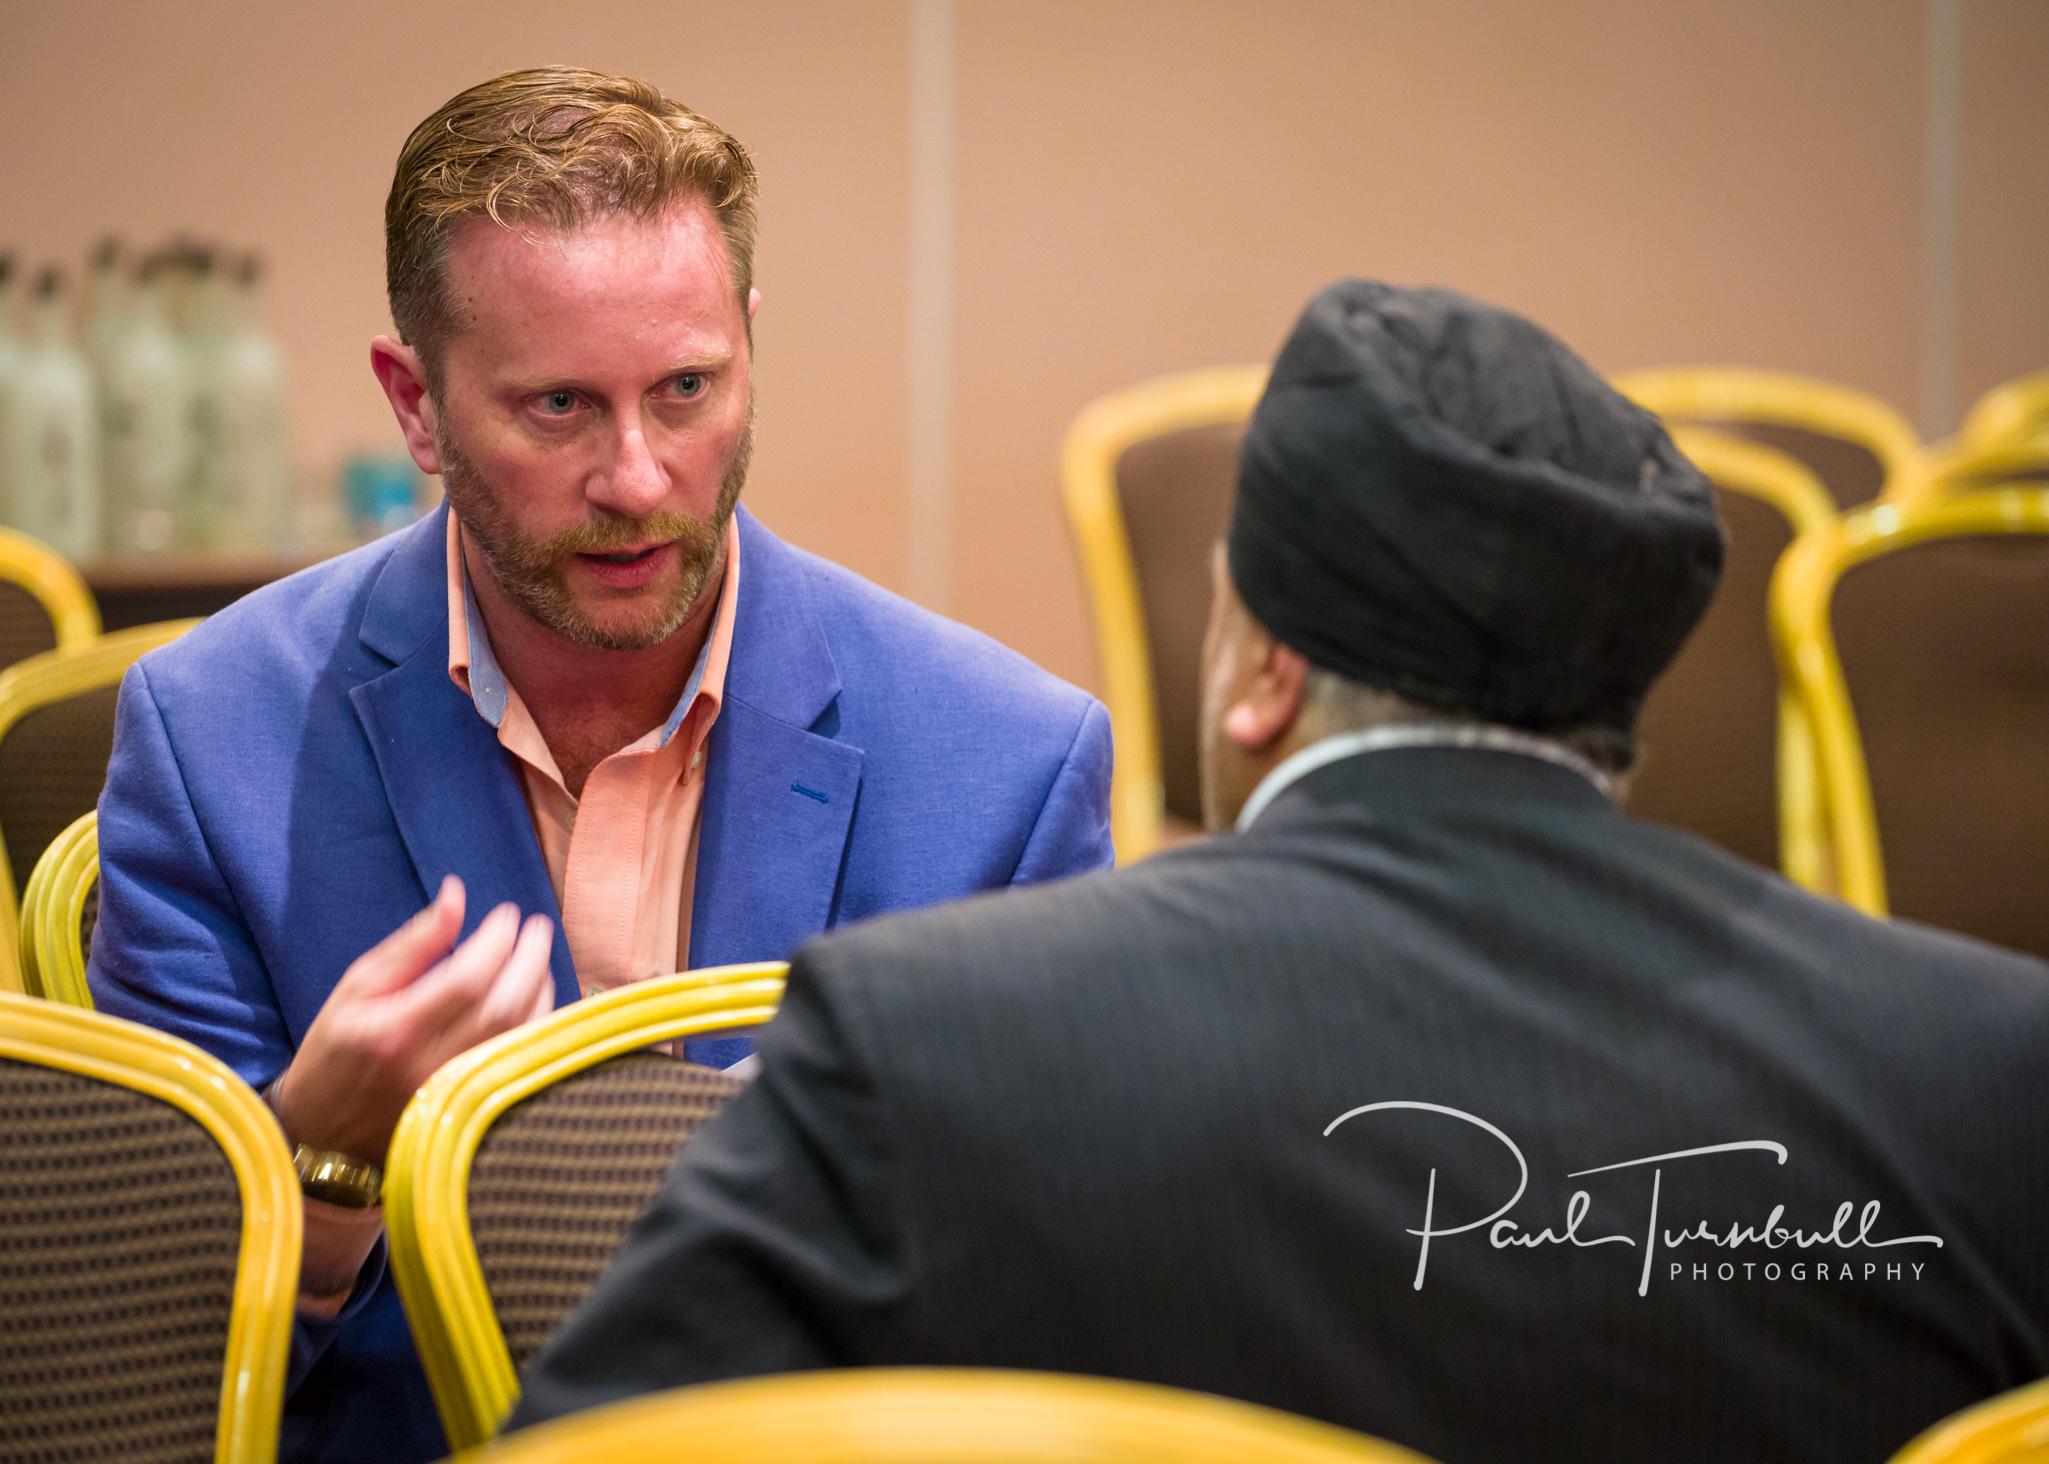 conference-event-photographer-queens-hotel-leeds-yorkshire-081.jpg